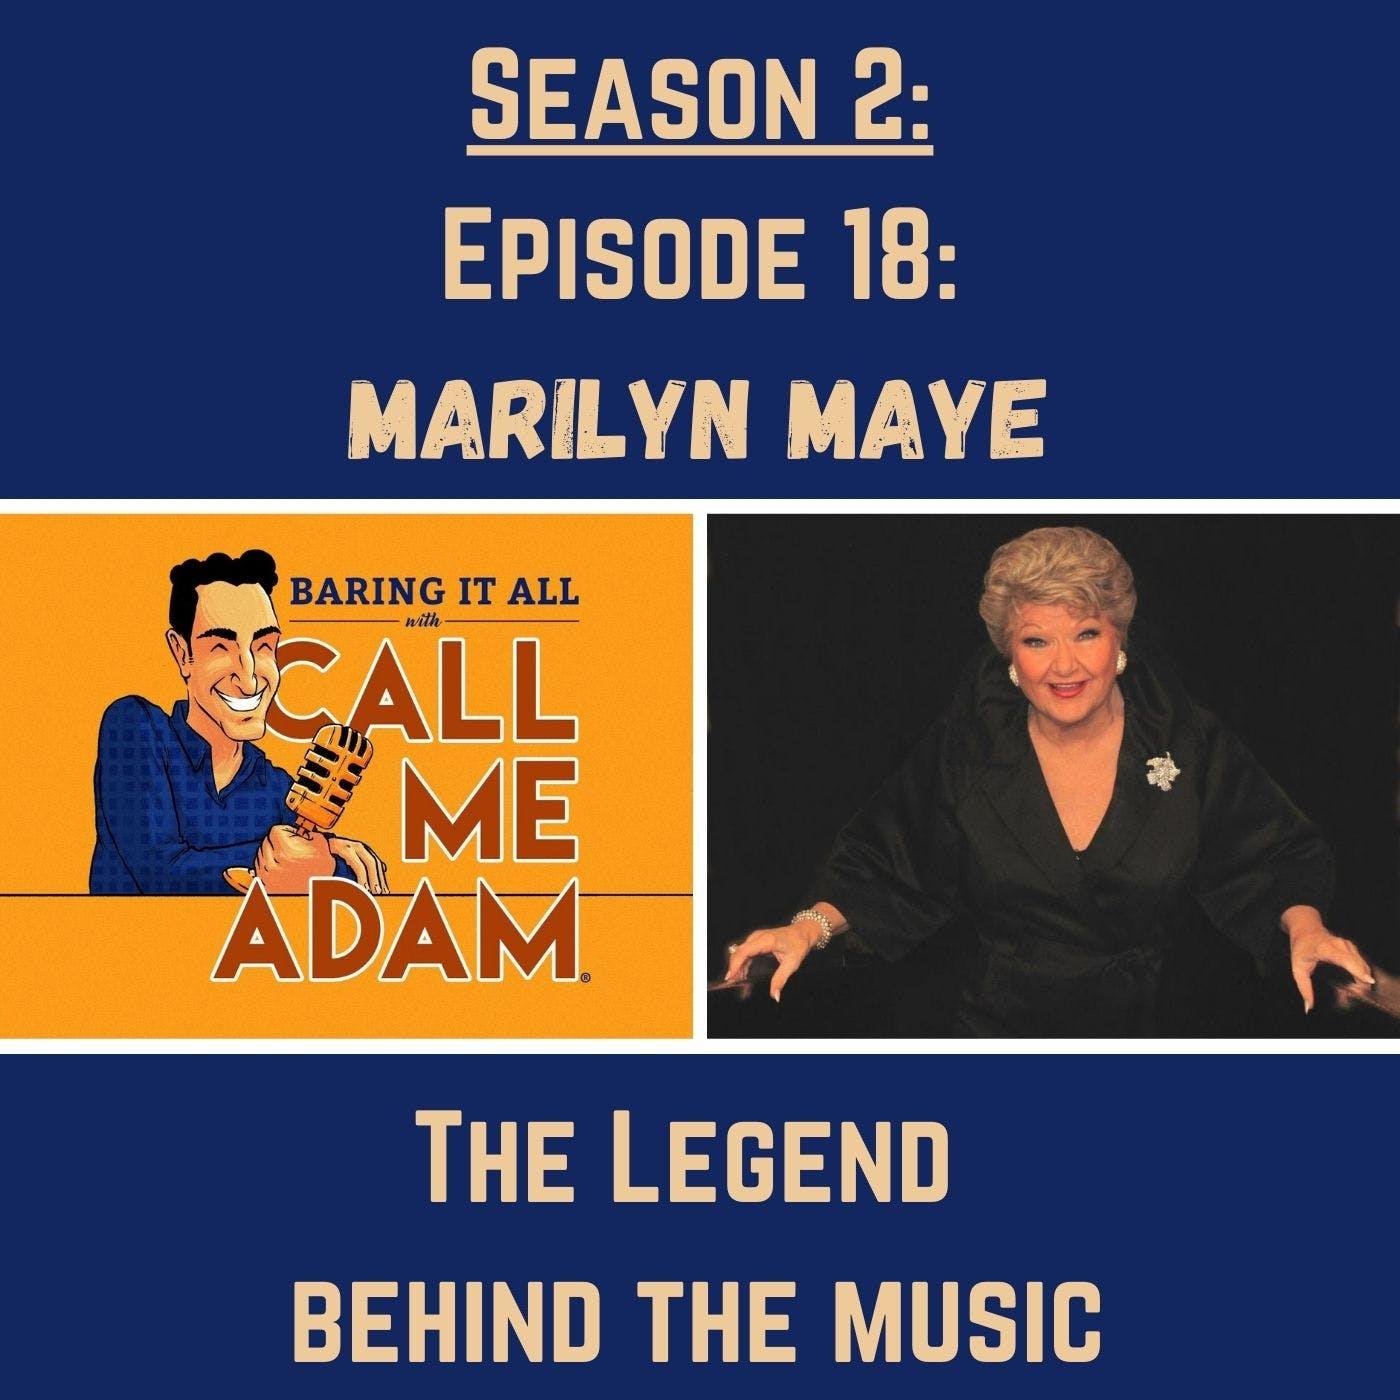 Season 2: Episode 18: Marilyn Maye: Icon, Singer, Survivor, Queen of Cabaret, Grammy Nominee, Broadway, Feinstein's/54 Below